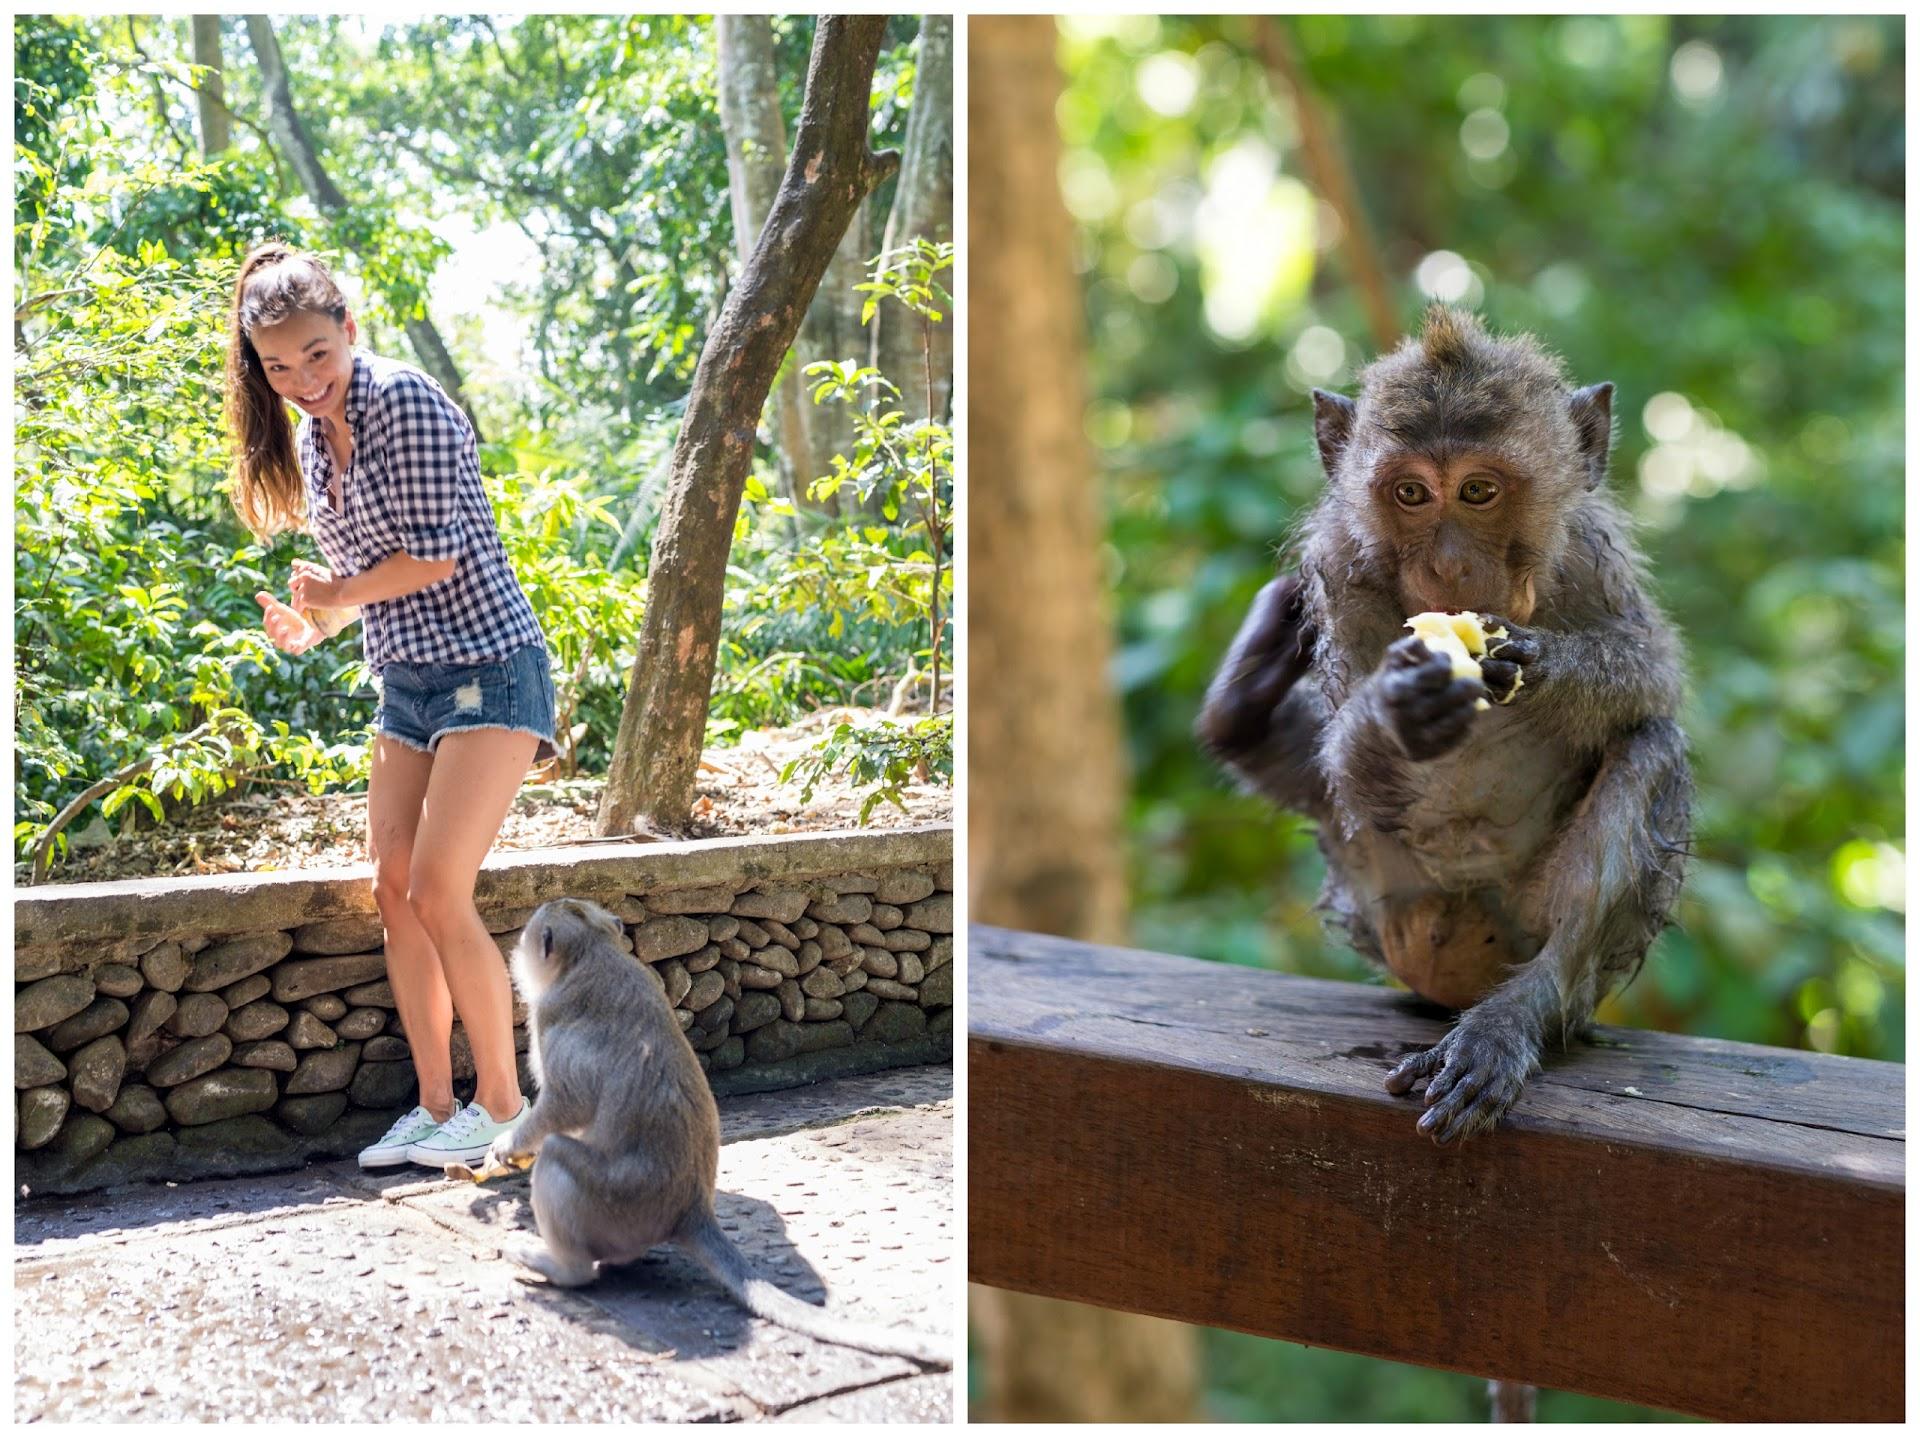 bali ubud monkey sanctuary, bali travel tips, monkey photography, travel photographer blogger, mint converse, what to wear hot humud climate, southeast asia, ootd, asian blogger, couple bloggers, korean, japanese